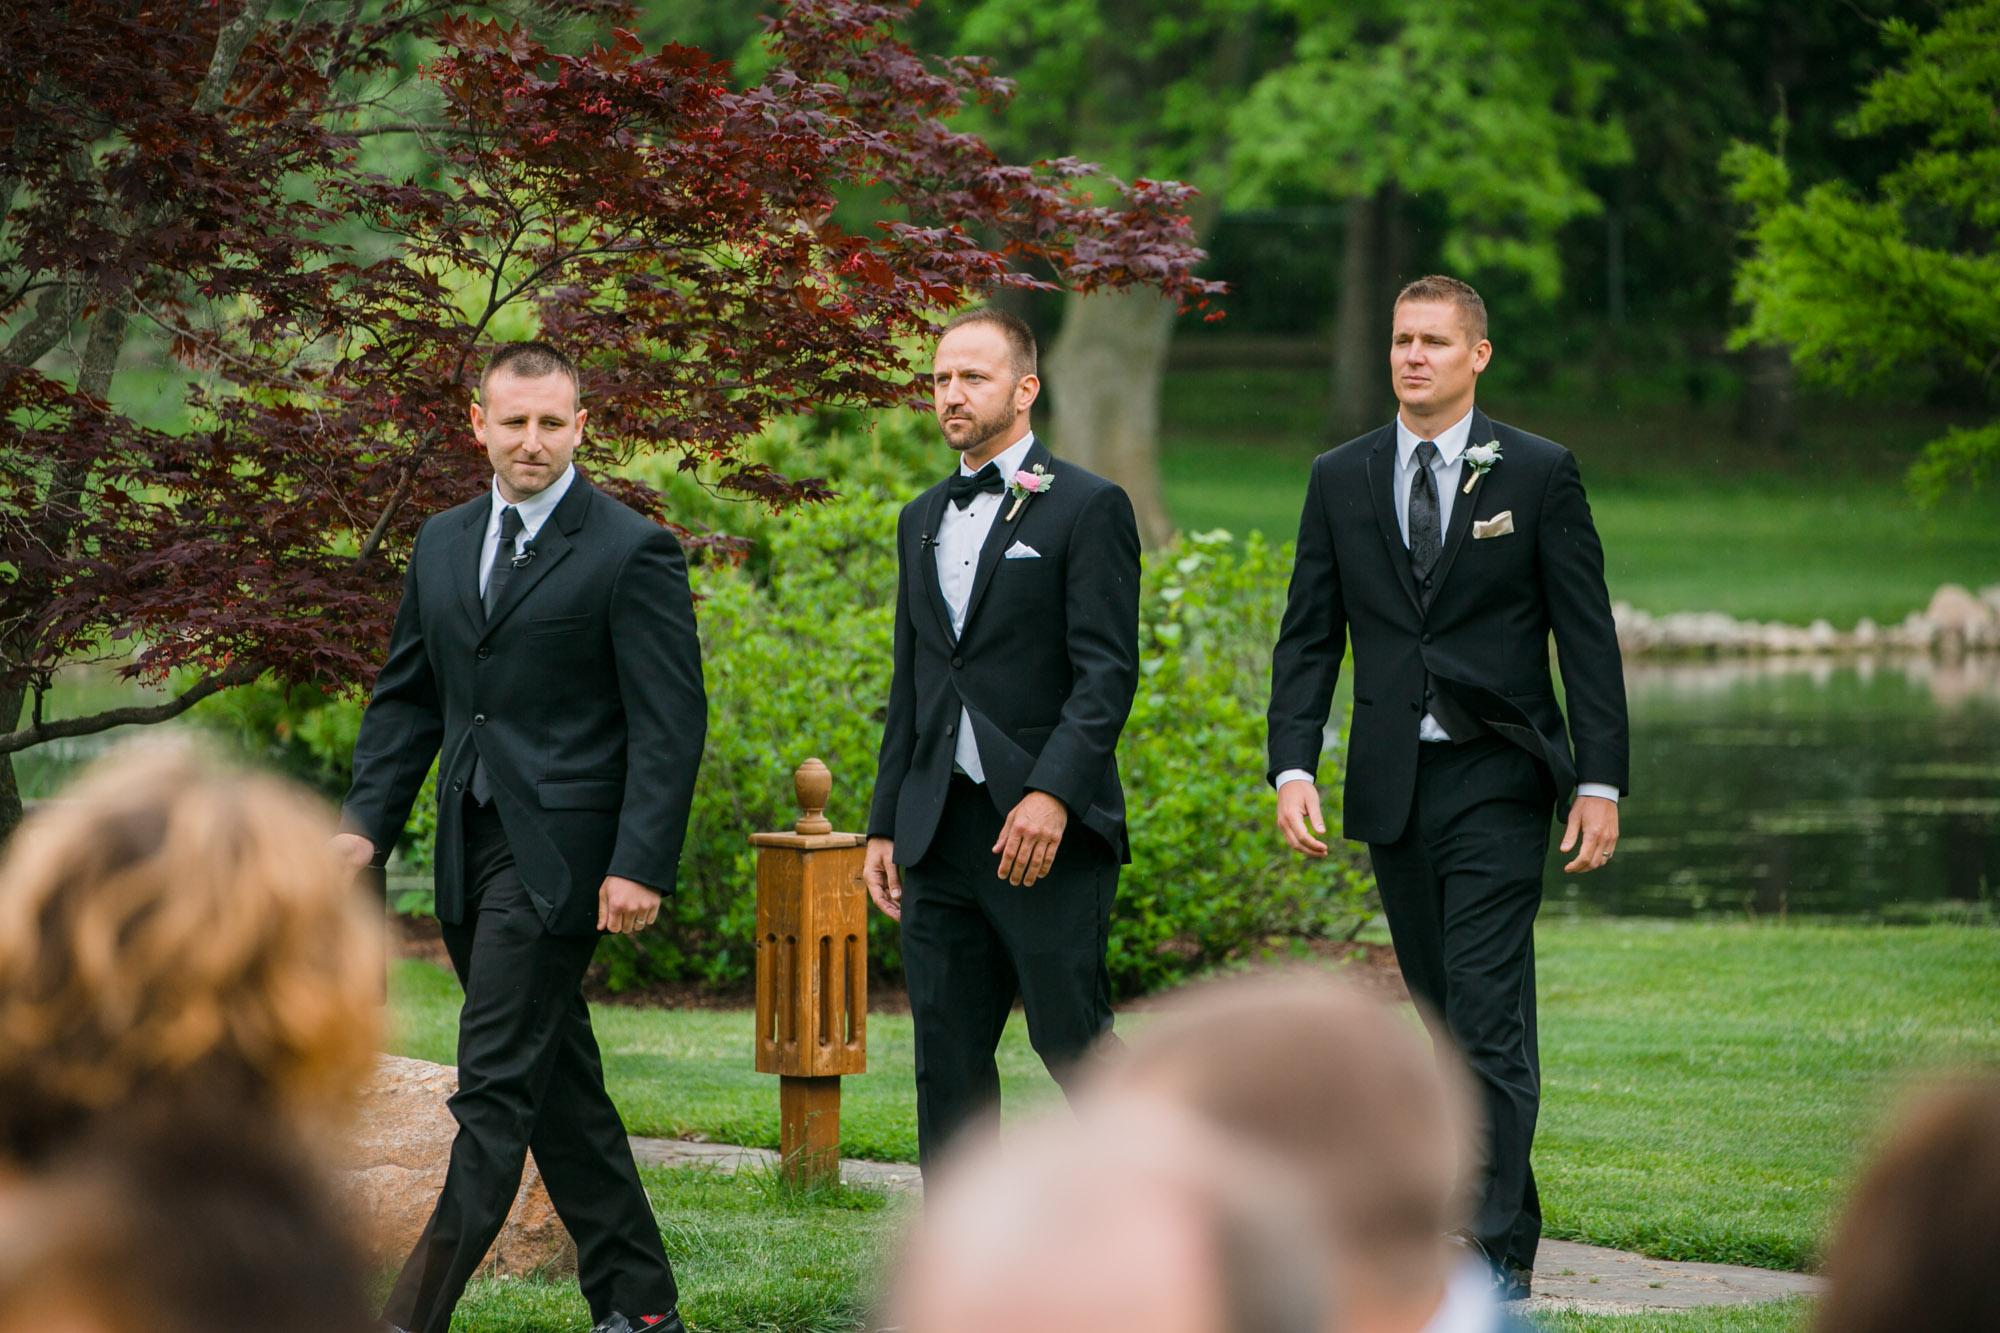 hensville-wedding-downtown-toledo-ohio (31 of 103).jpg